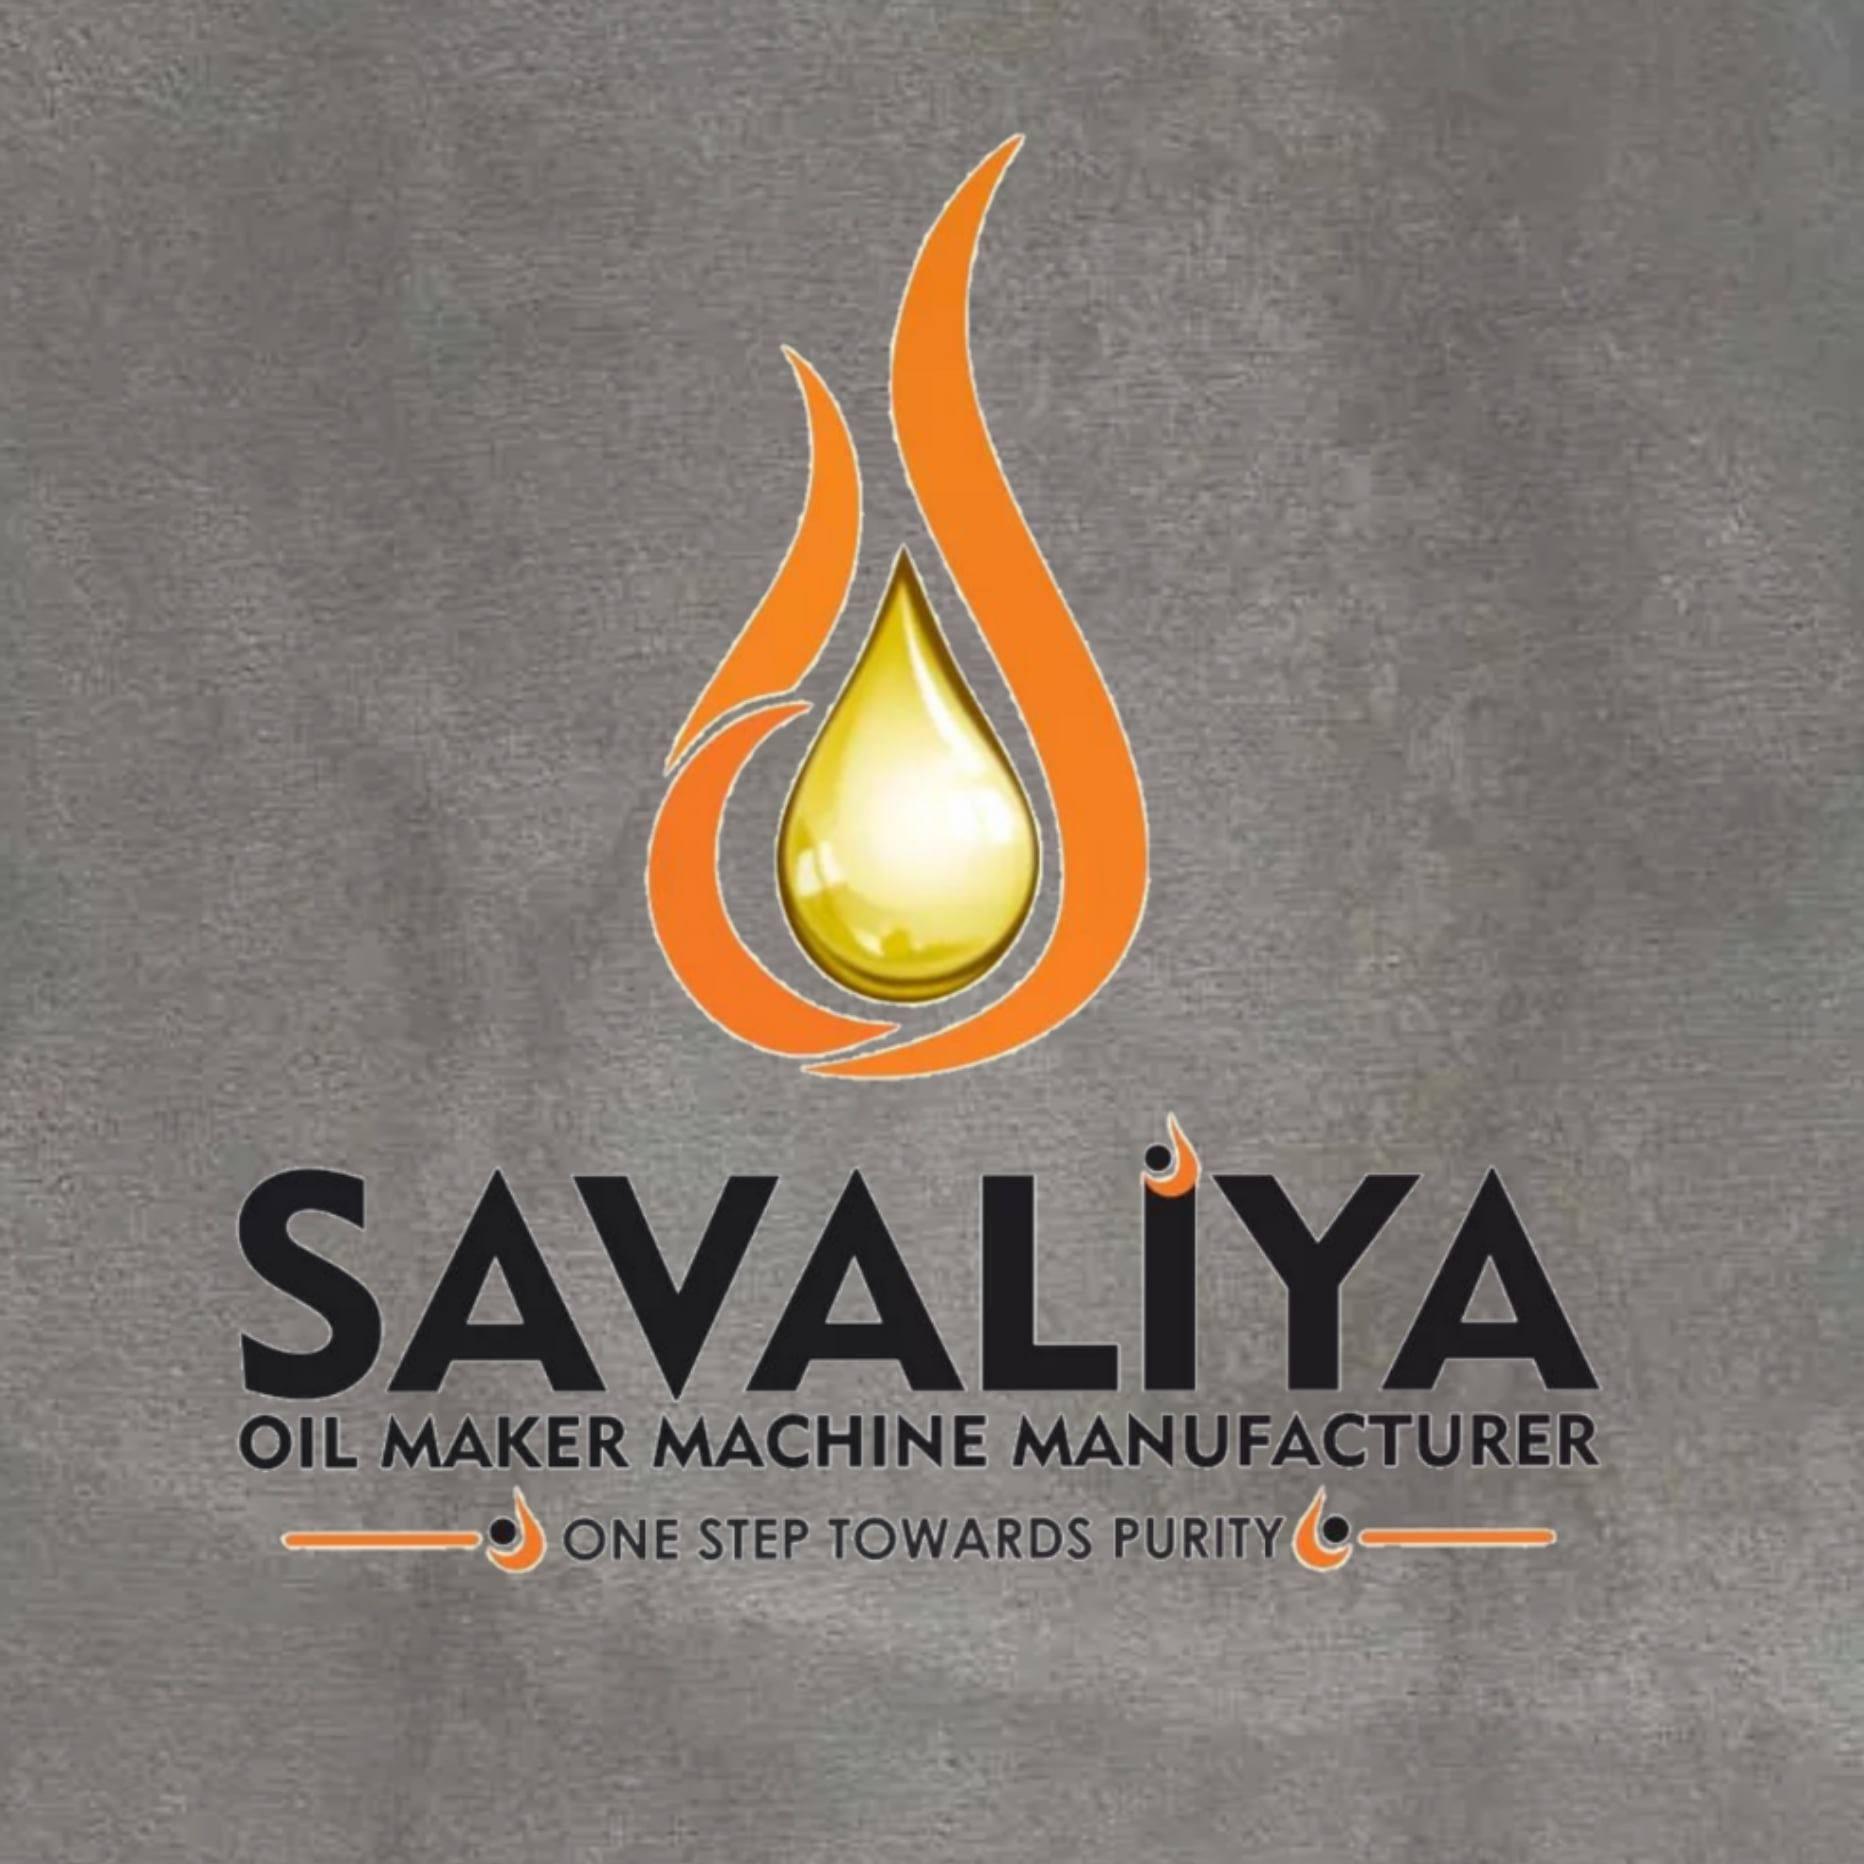 Savaliya Oil Maker